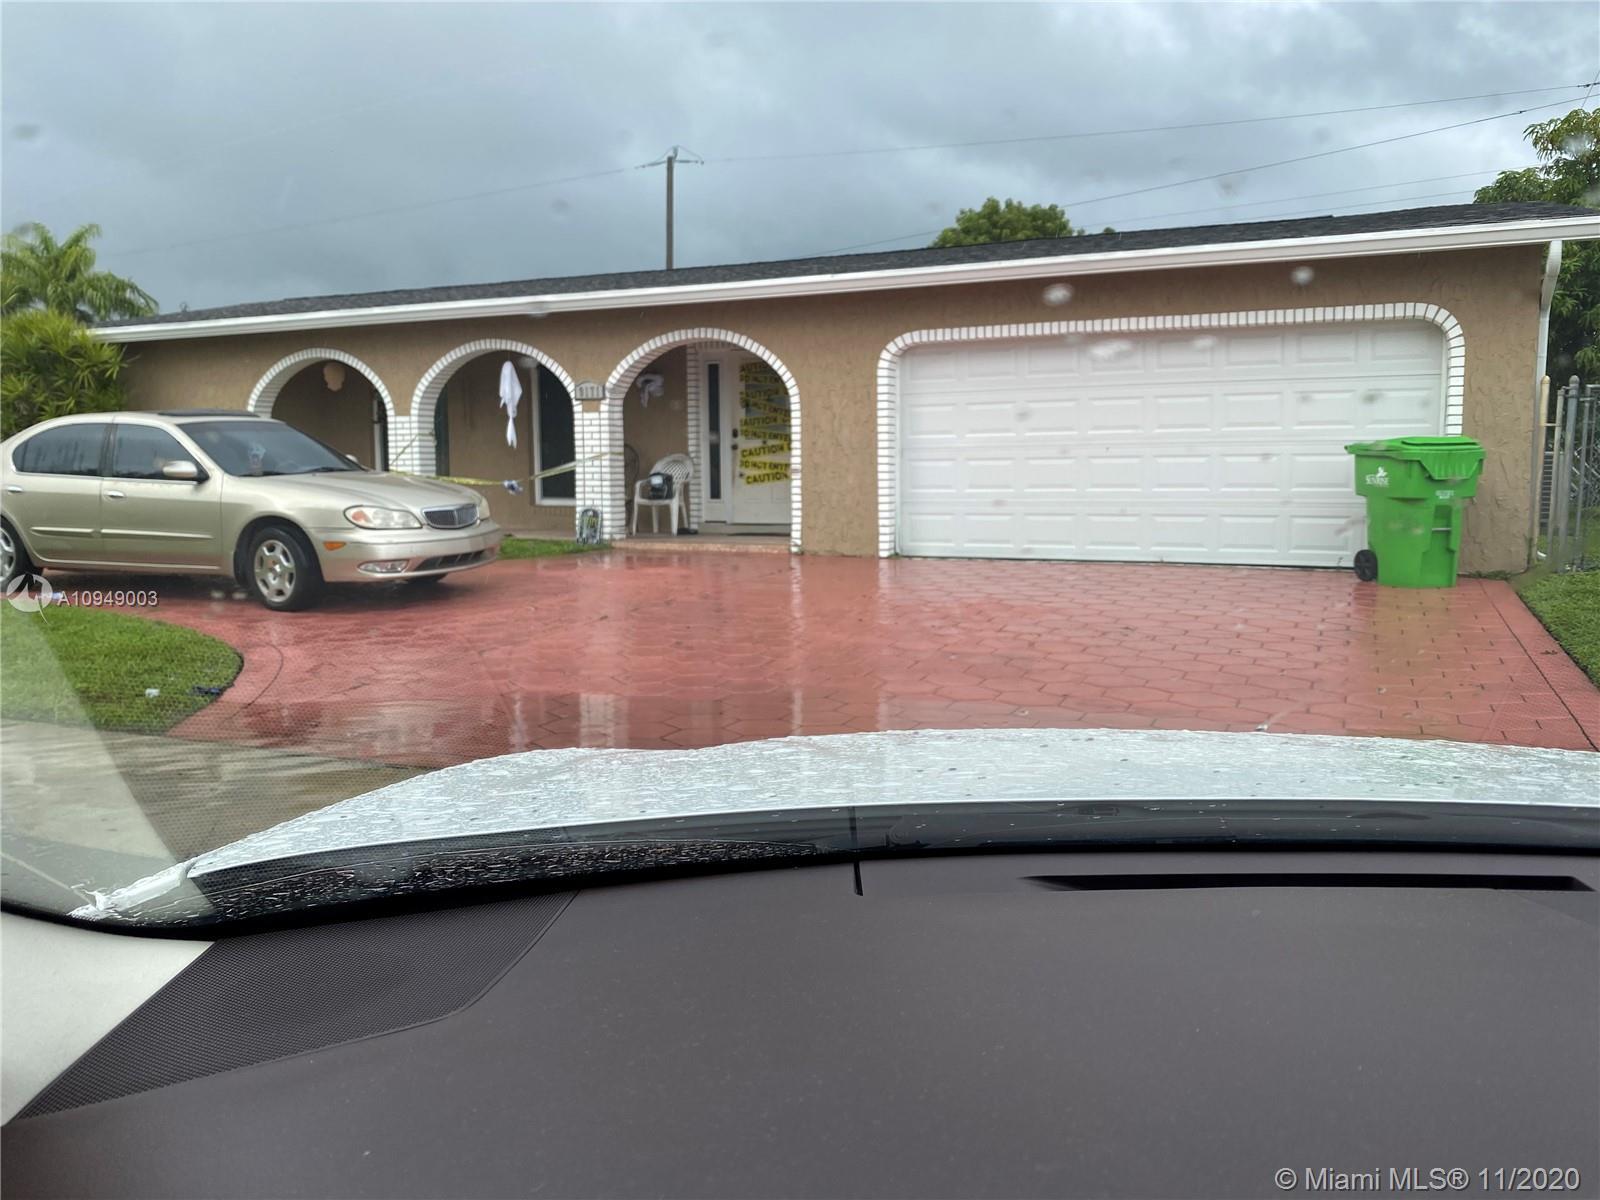 Sunrise Golf Village - 9171 NW 21st Mnr, Sunrise, FL 33322